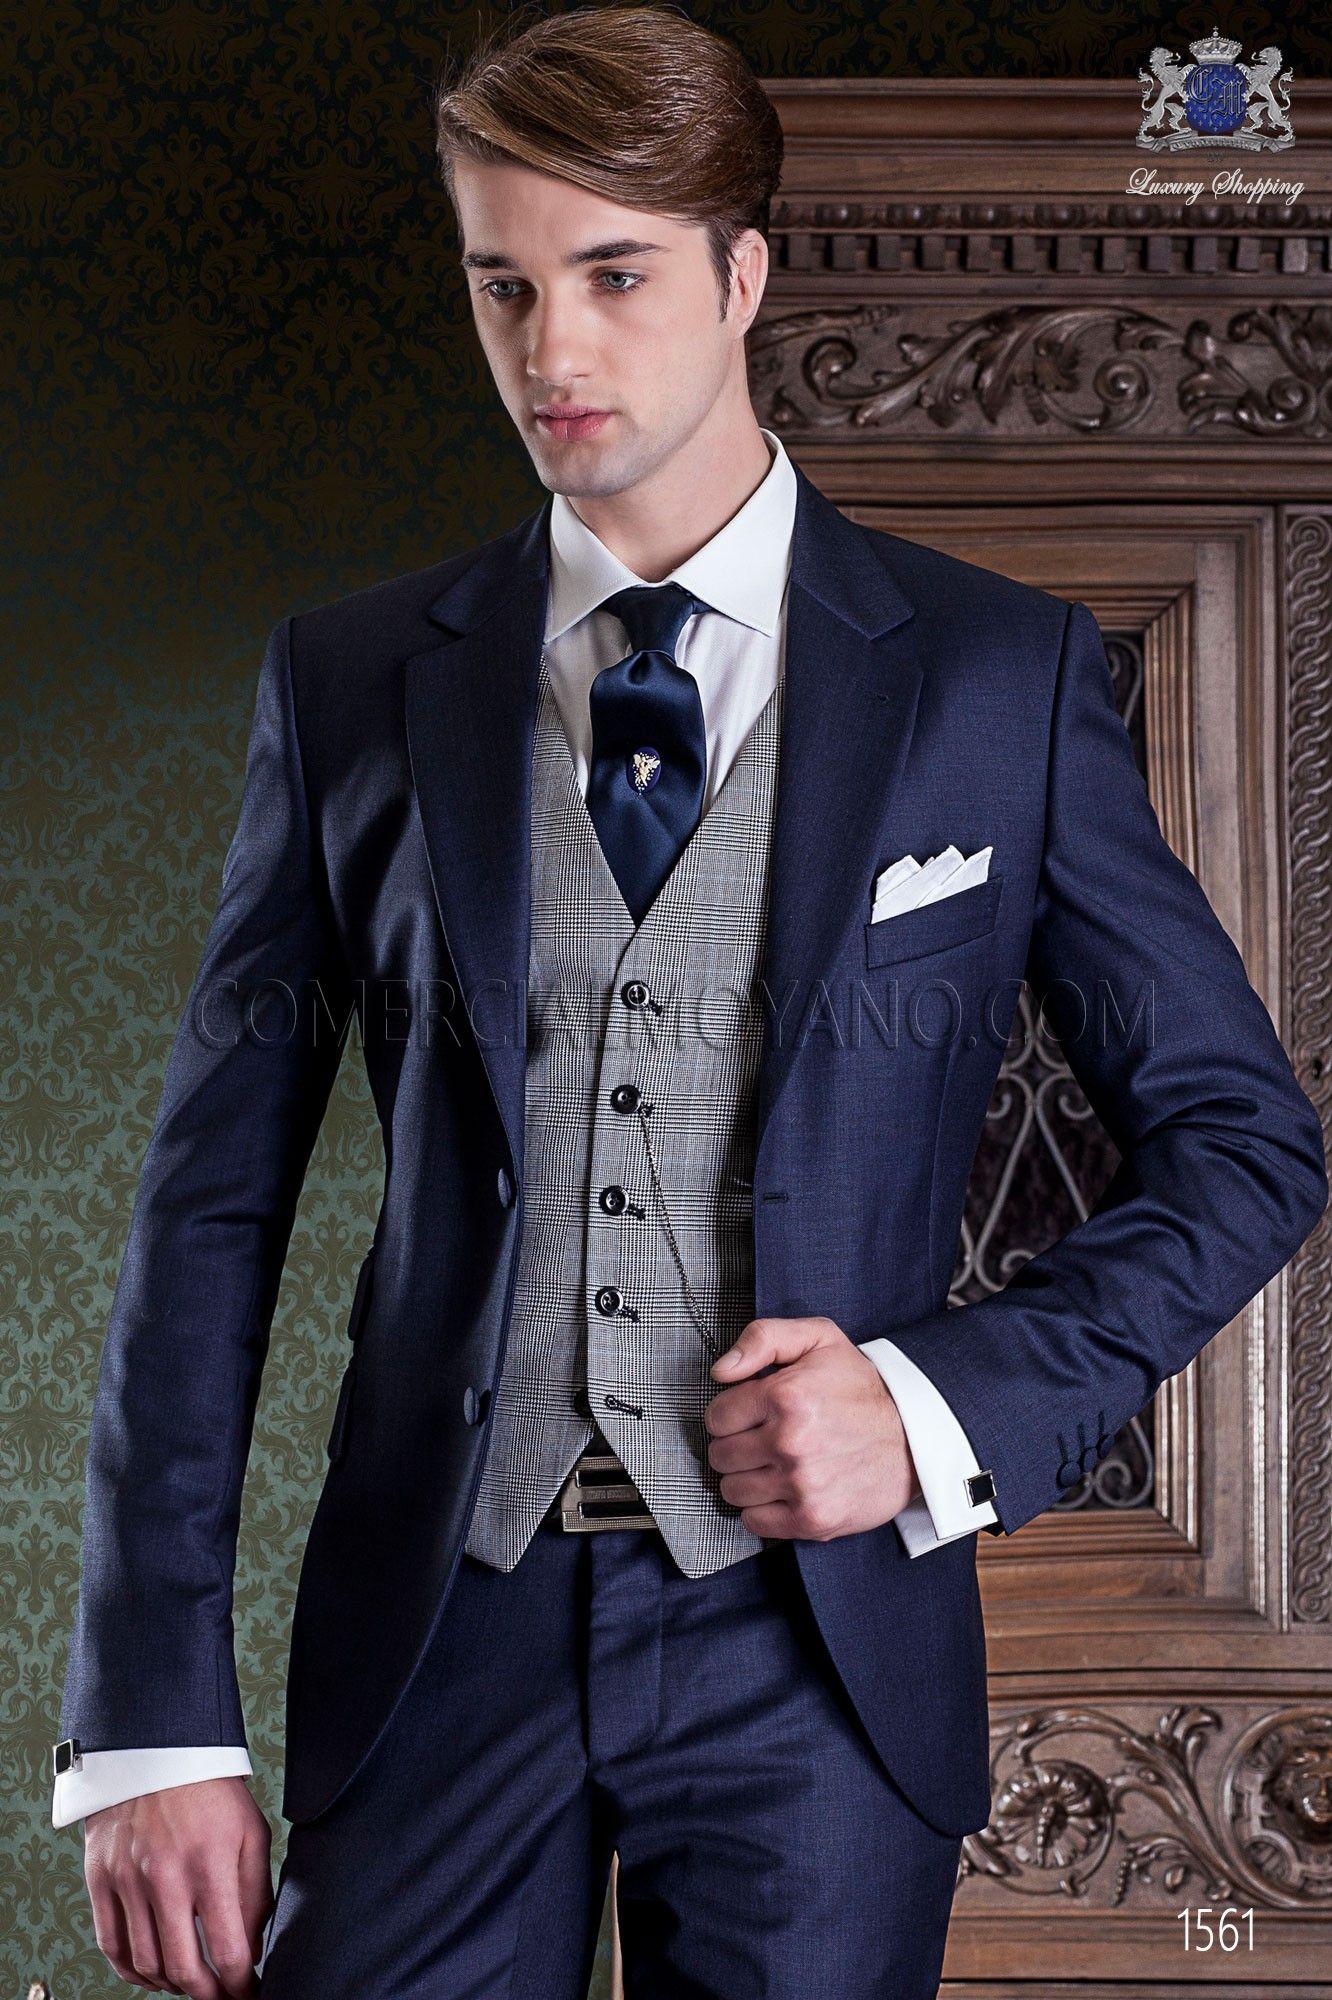 costume de mariage bleu marine de pur laine ottavio nuccio gala homme pinterest costumes. Black Bedroom Furniture Sets. Home Design Ideas